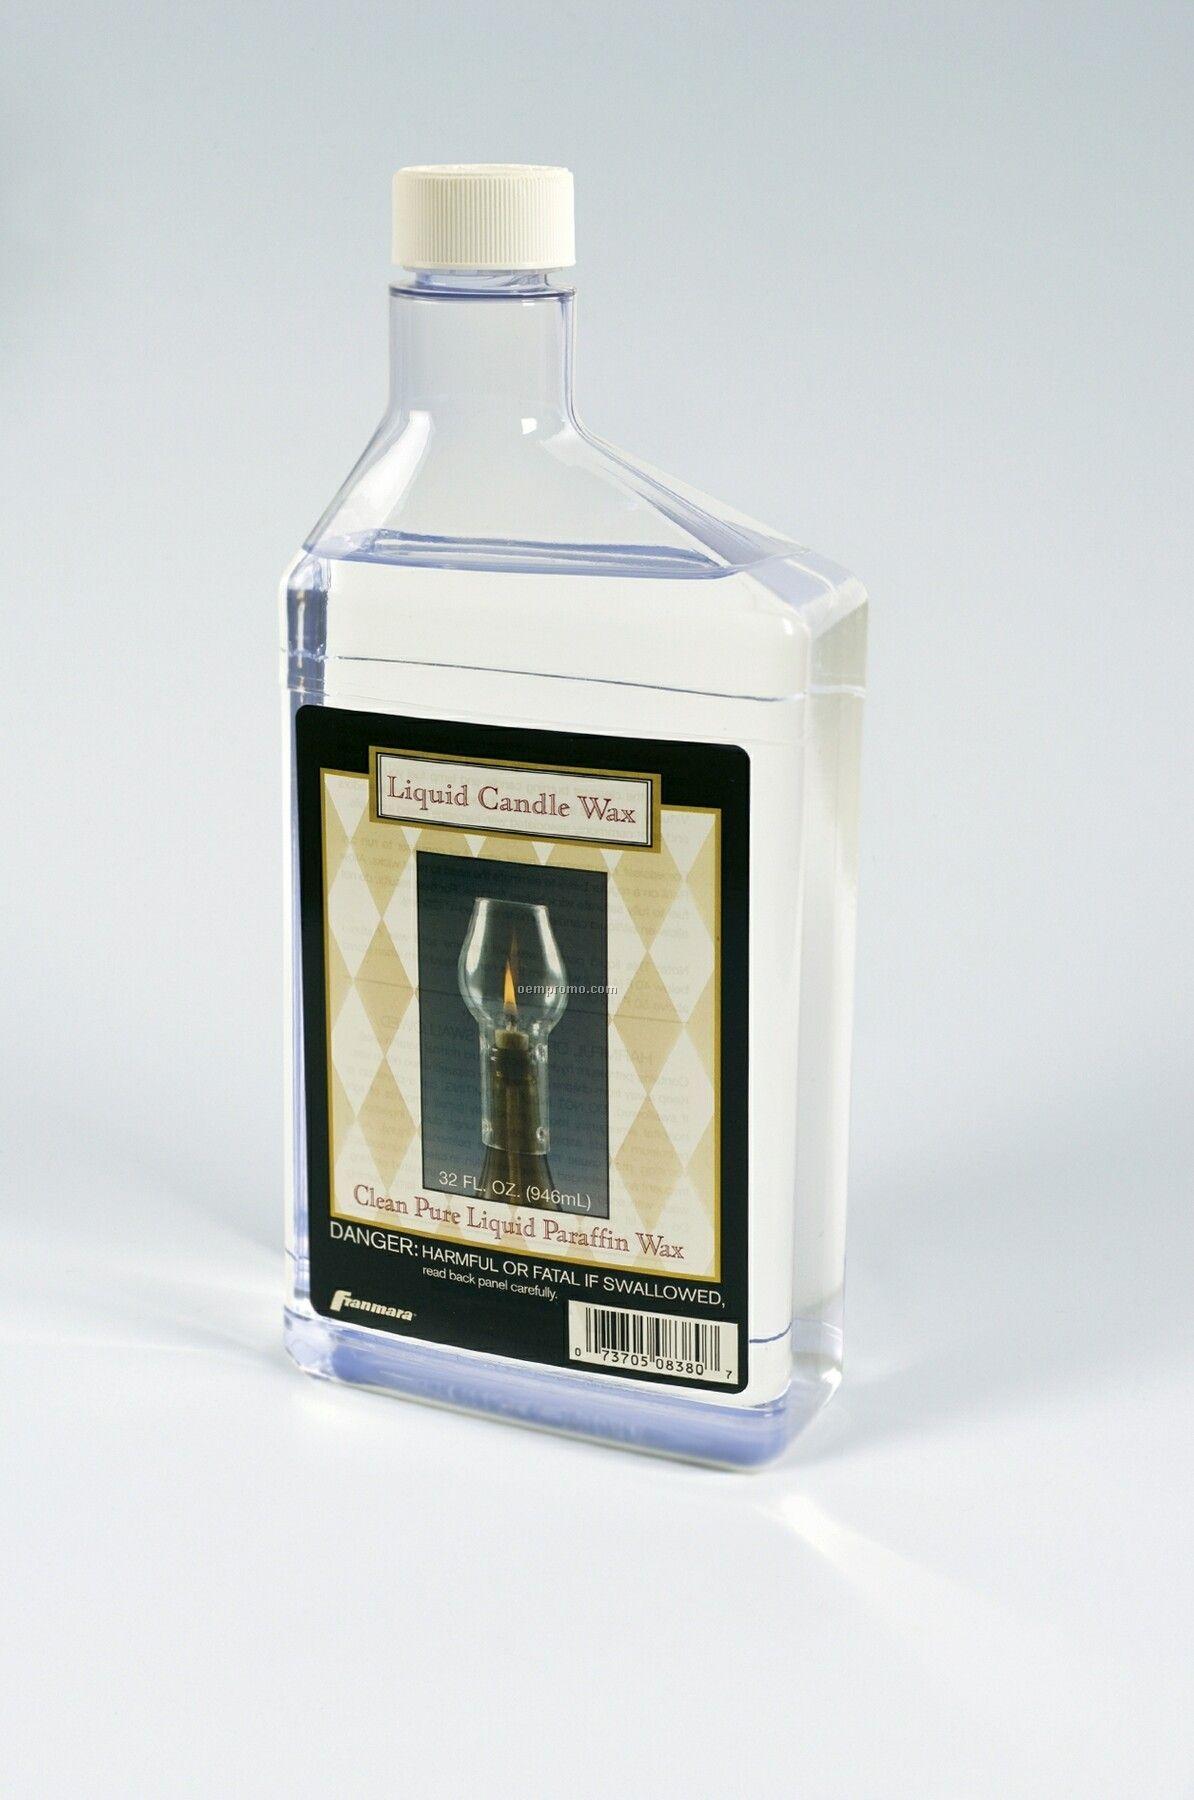 Liquid Candle Wax/ Lamp Oil